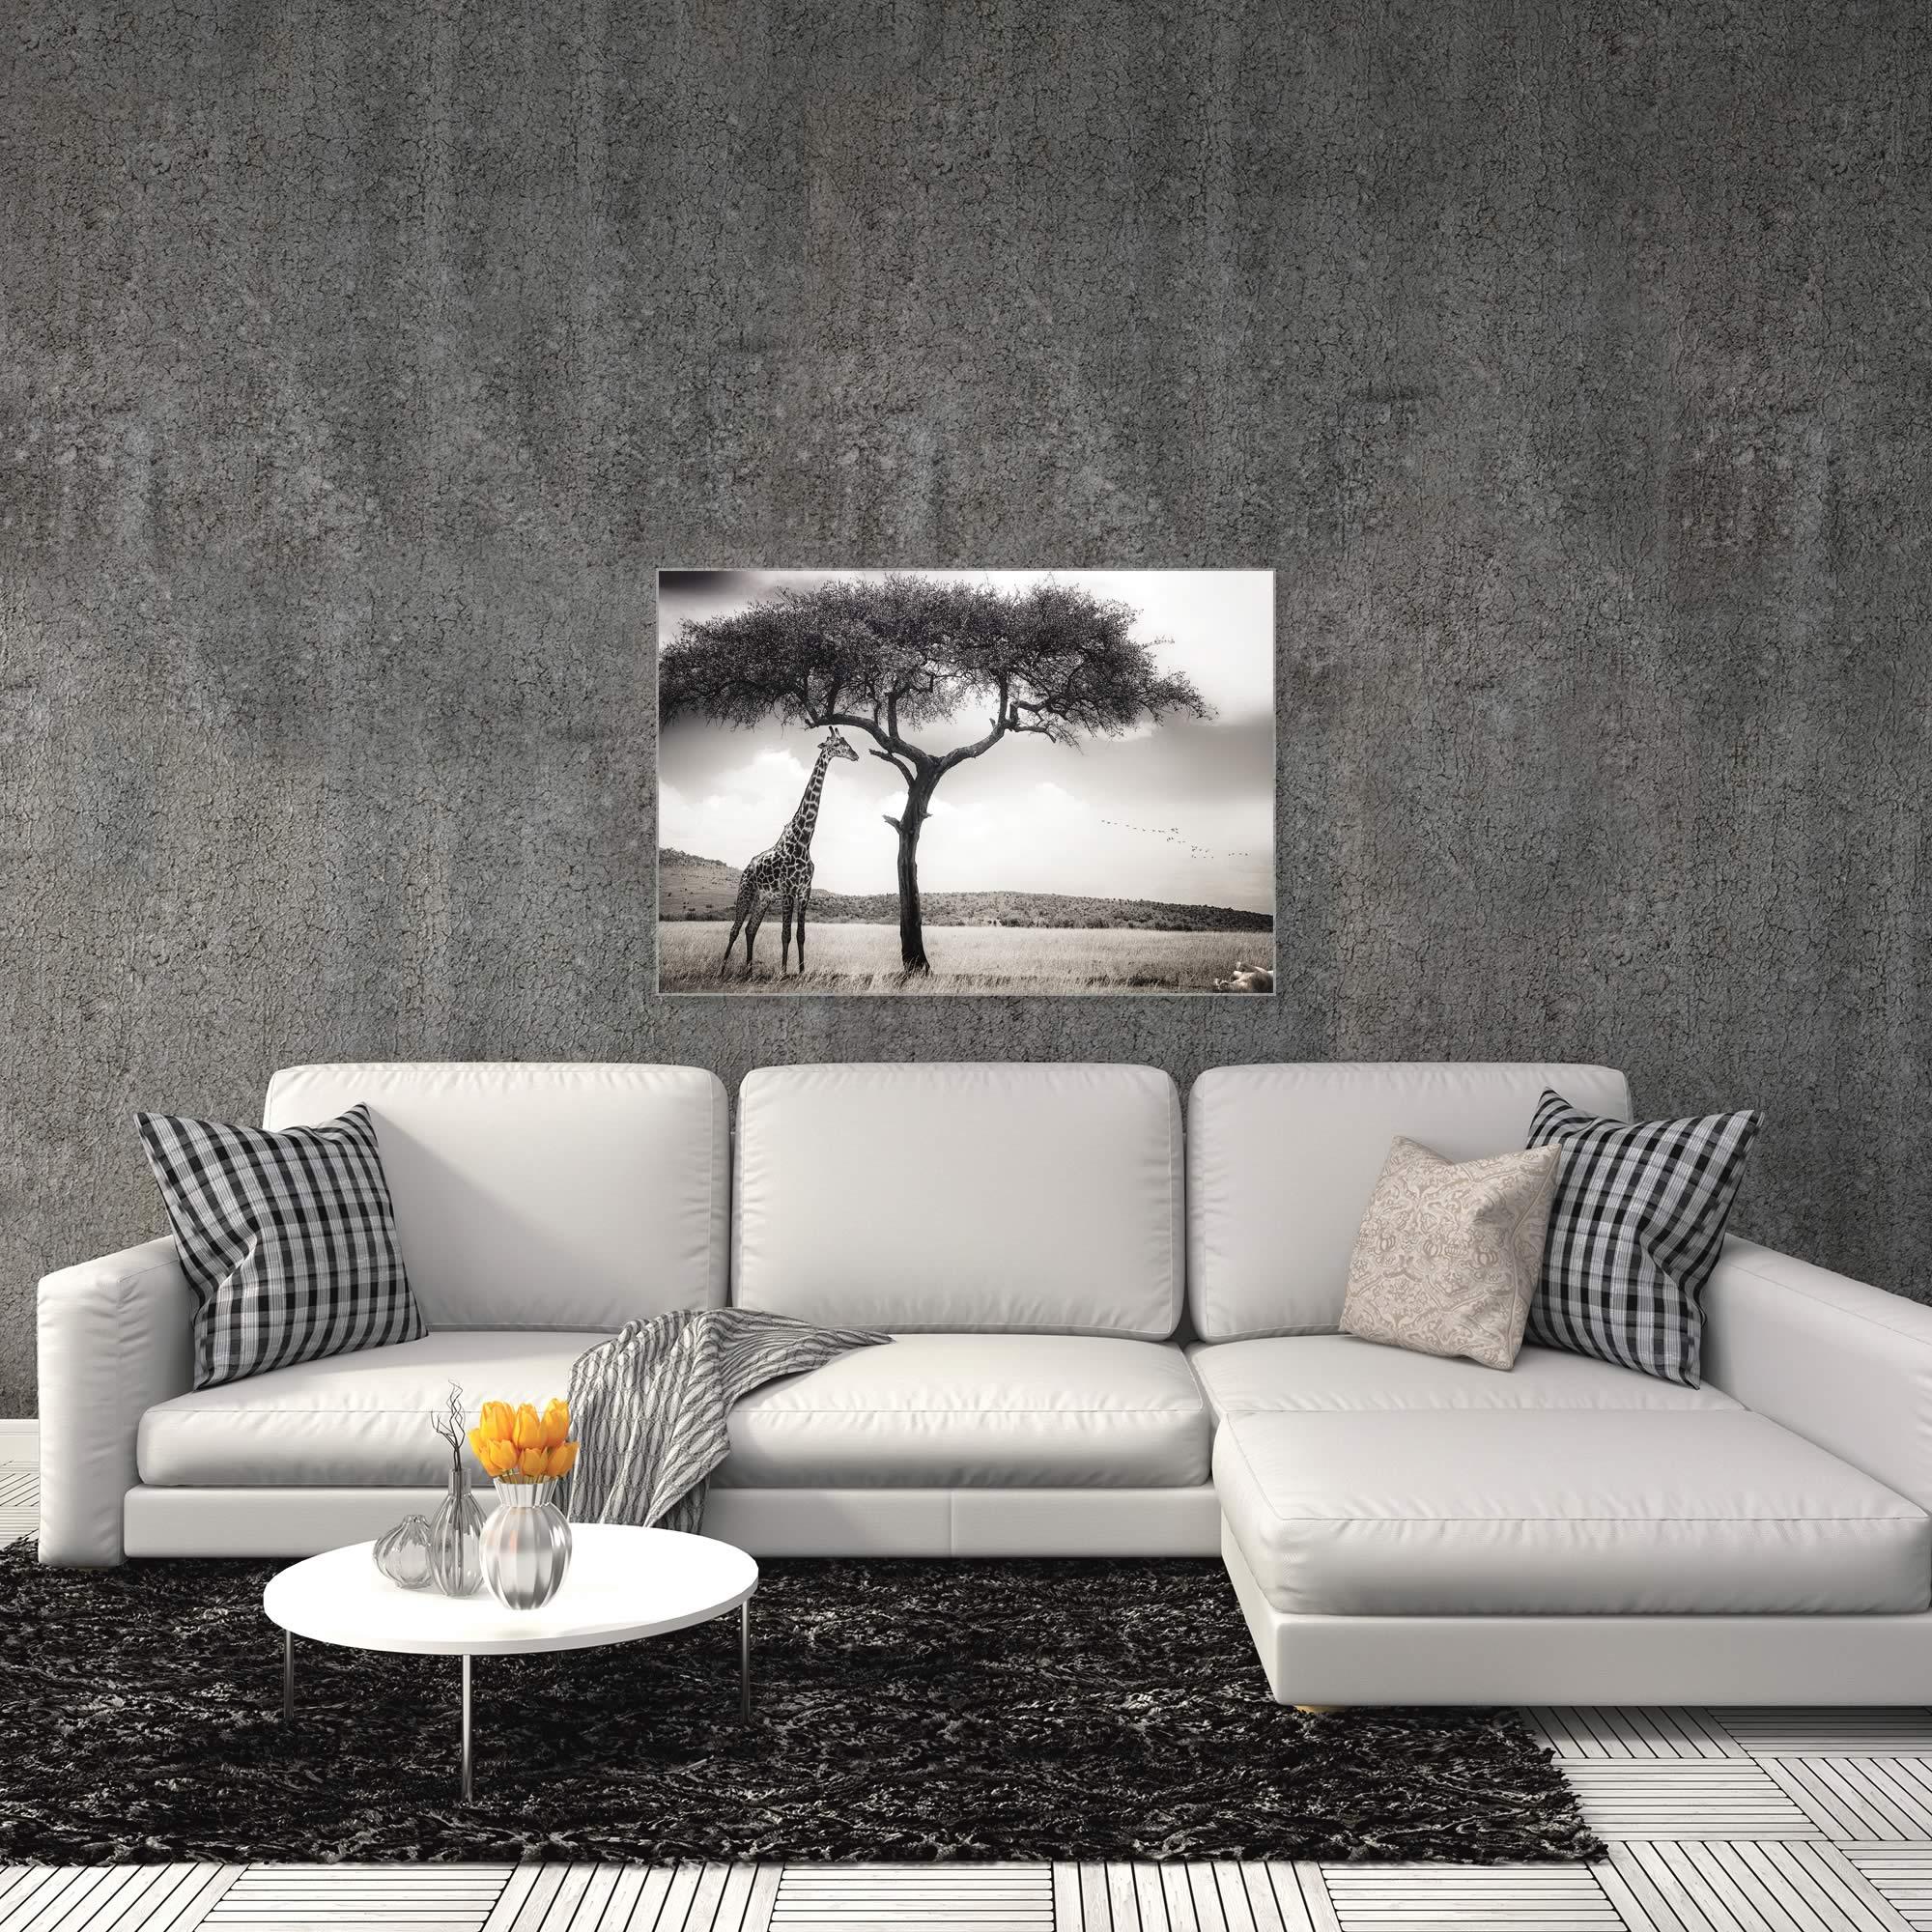 Under the African Sun by Piet Flour - Giraffe Wall Art on Metal or Acrylic - Alternate View 3